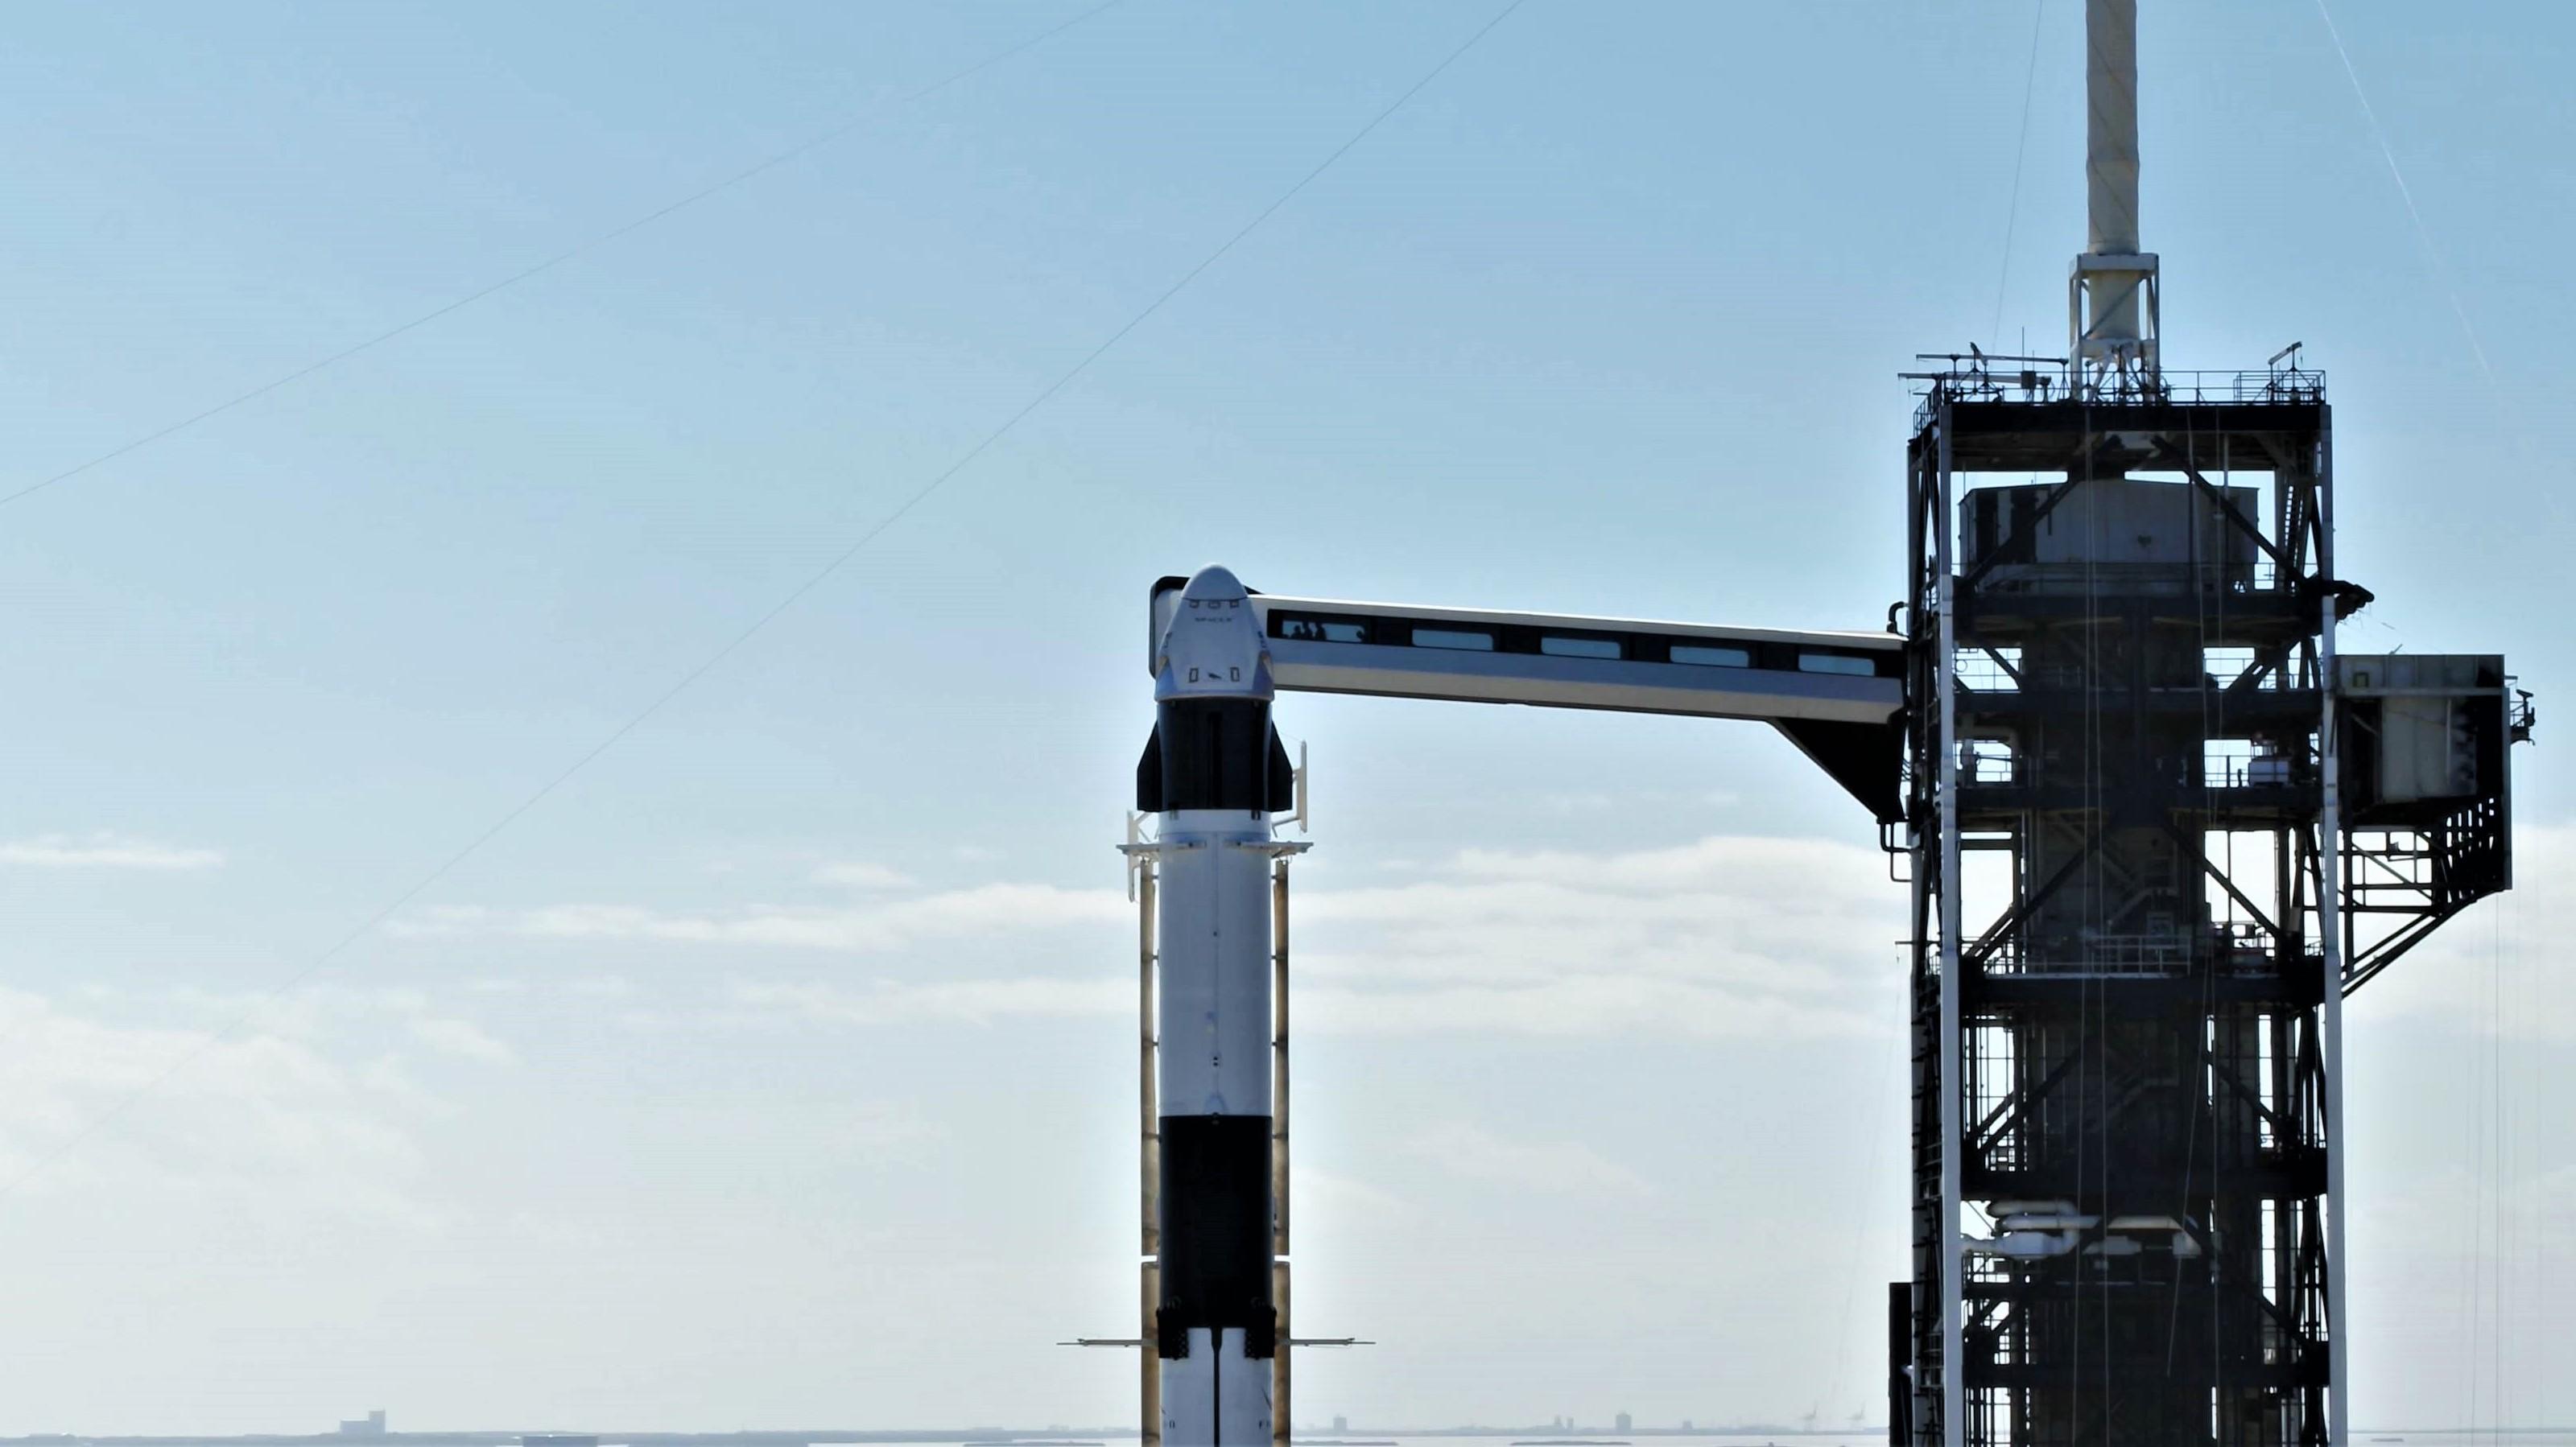 Crew Dragon Falcon 9 DM-1 vertical 39A (SpaceX) 15